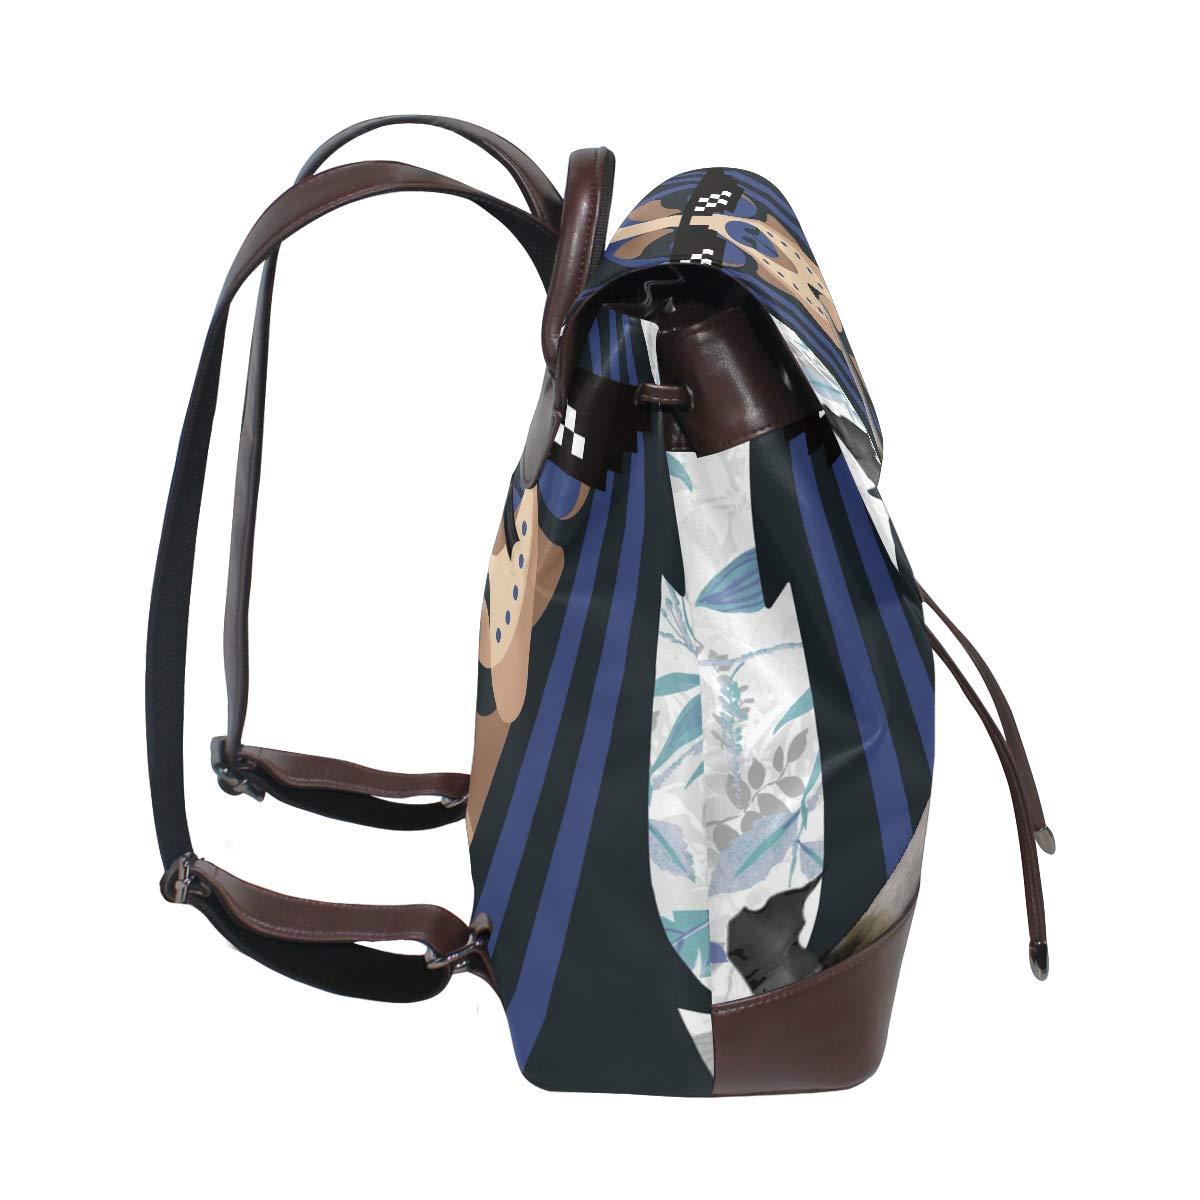 PU Leather Shoulder Bag,Blue Hair Dog Backpack,Portable Travel School Rucksack,Satchel with Top Handle